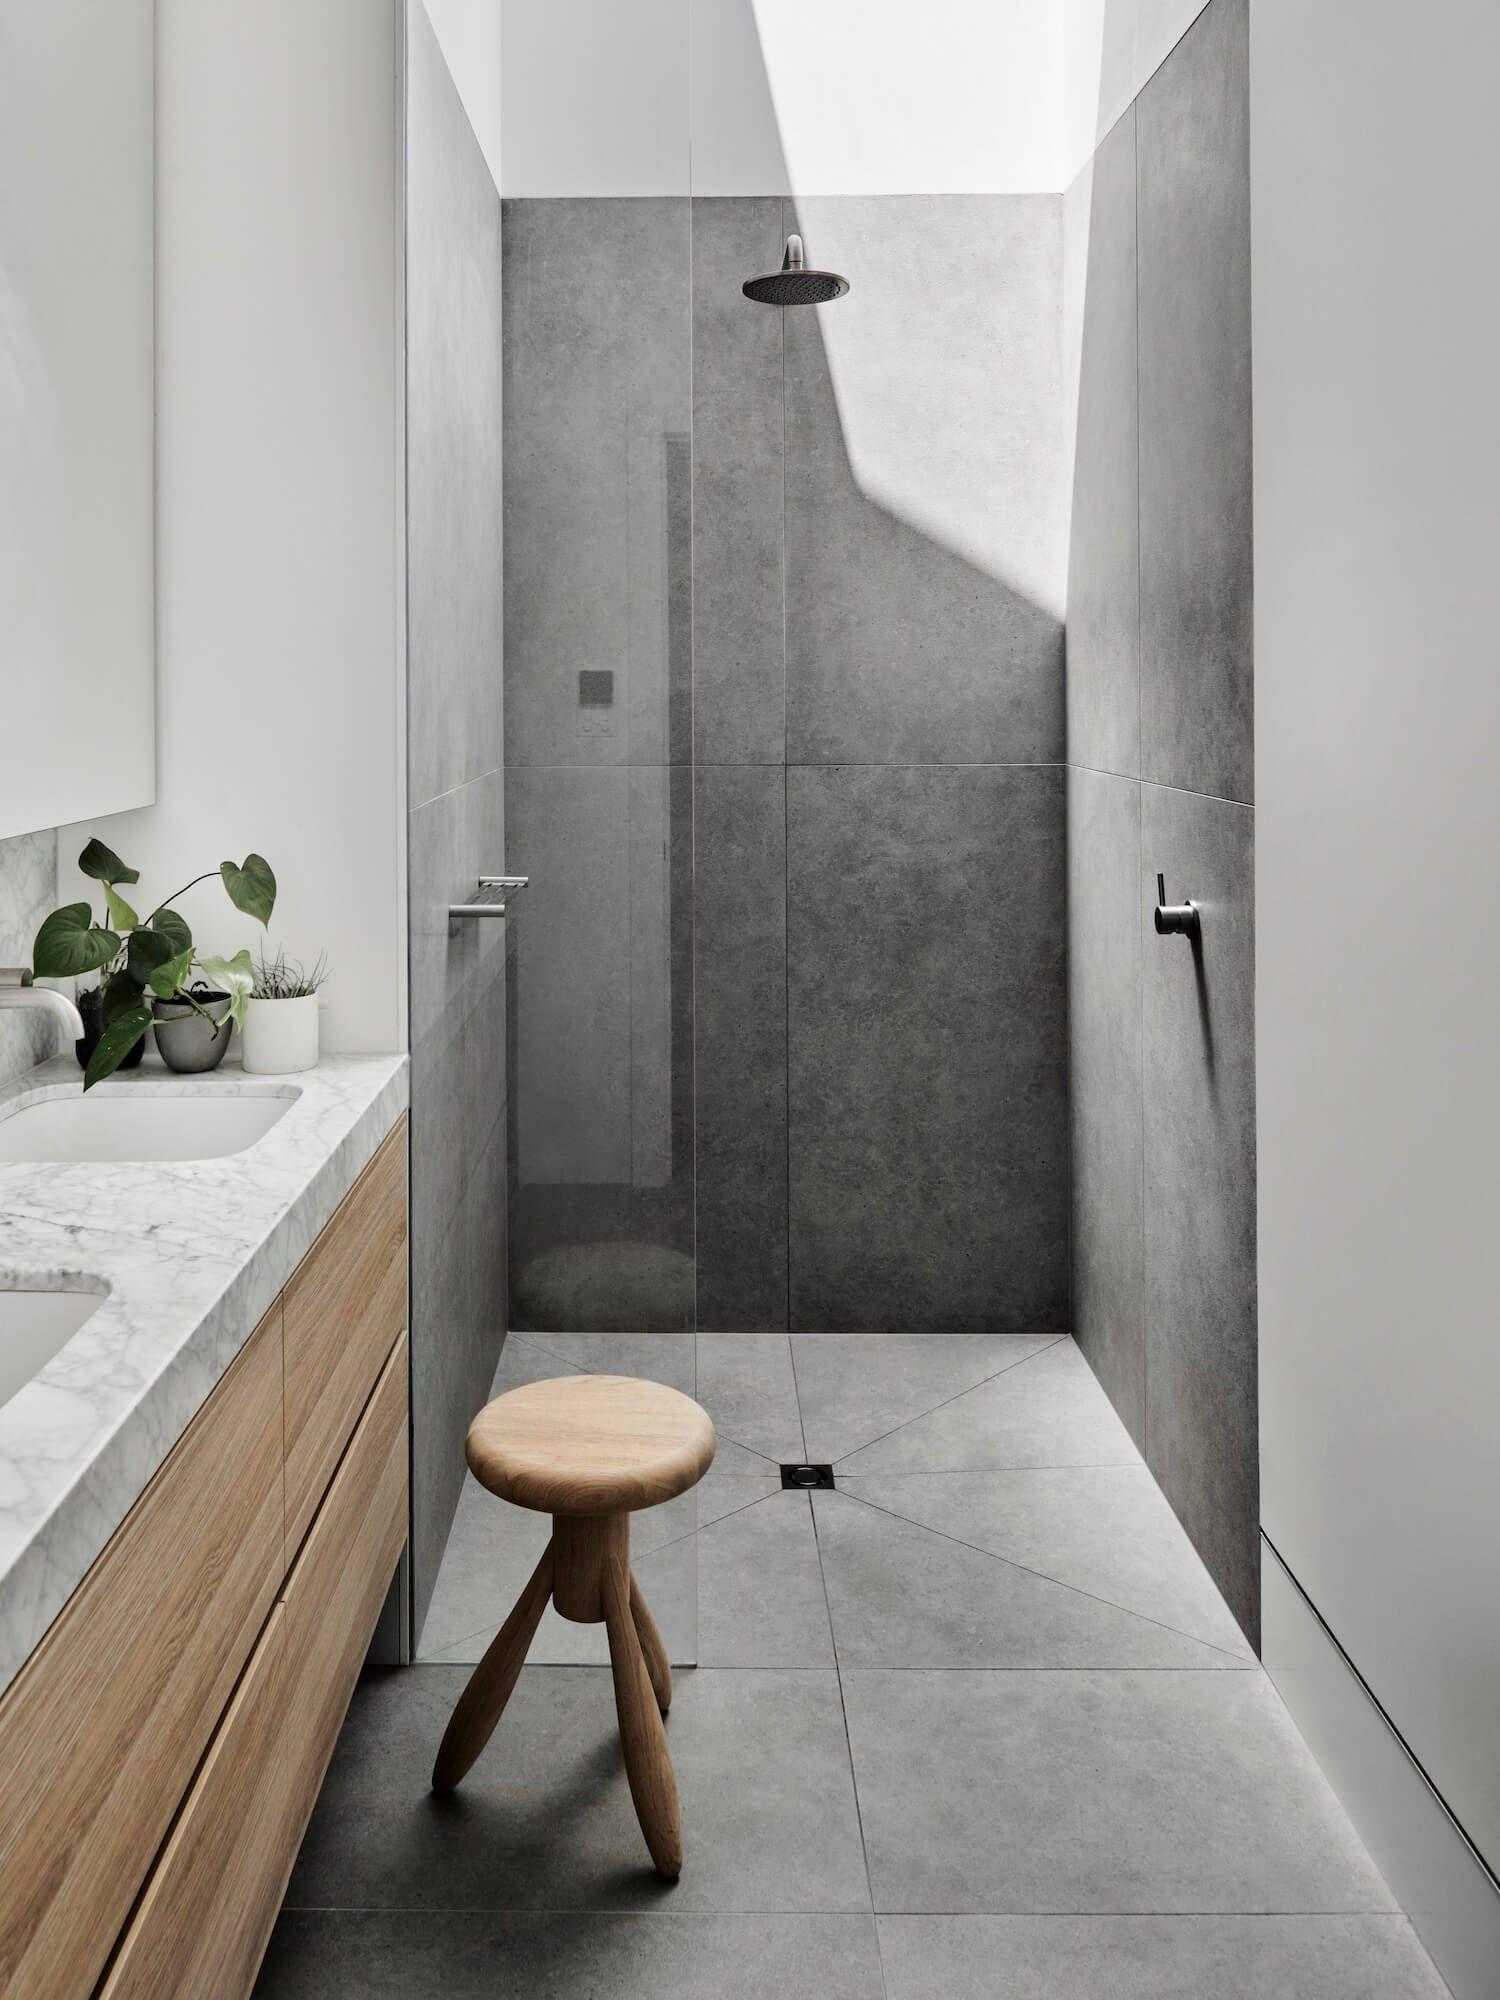 Bendigo Street Home By Pipkorn Kilpatrick Stone Tile Bathroom